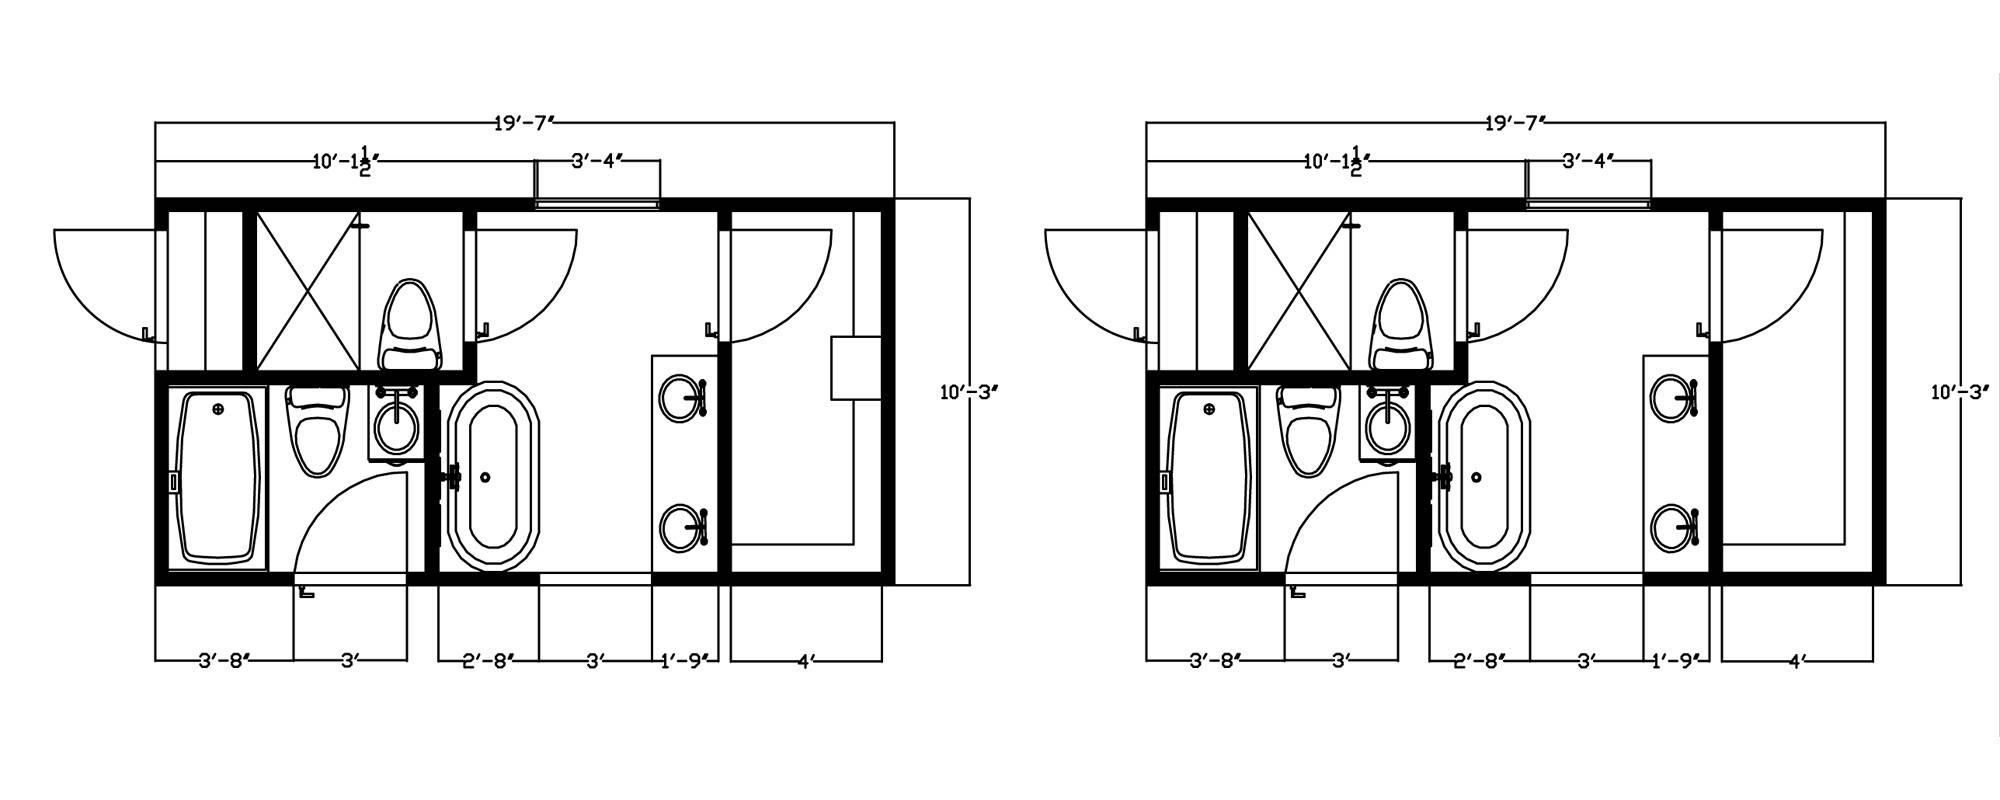 Master Bathroom Floor Plans Closets